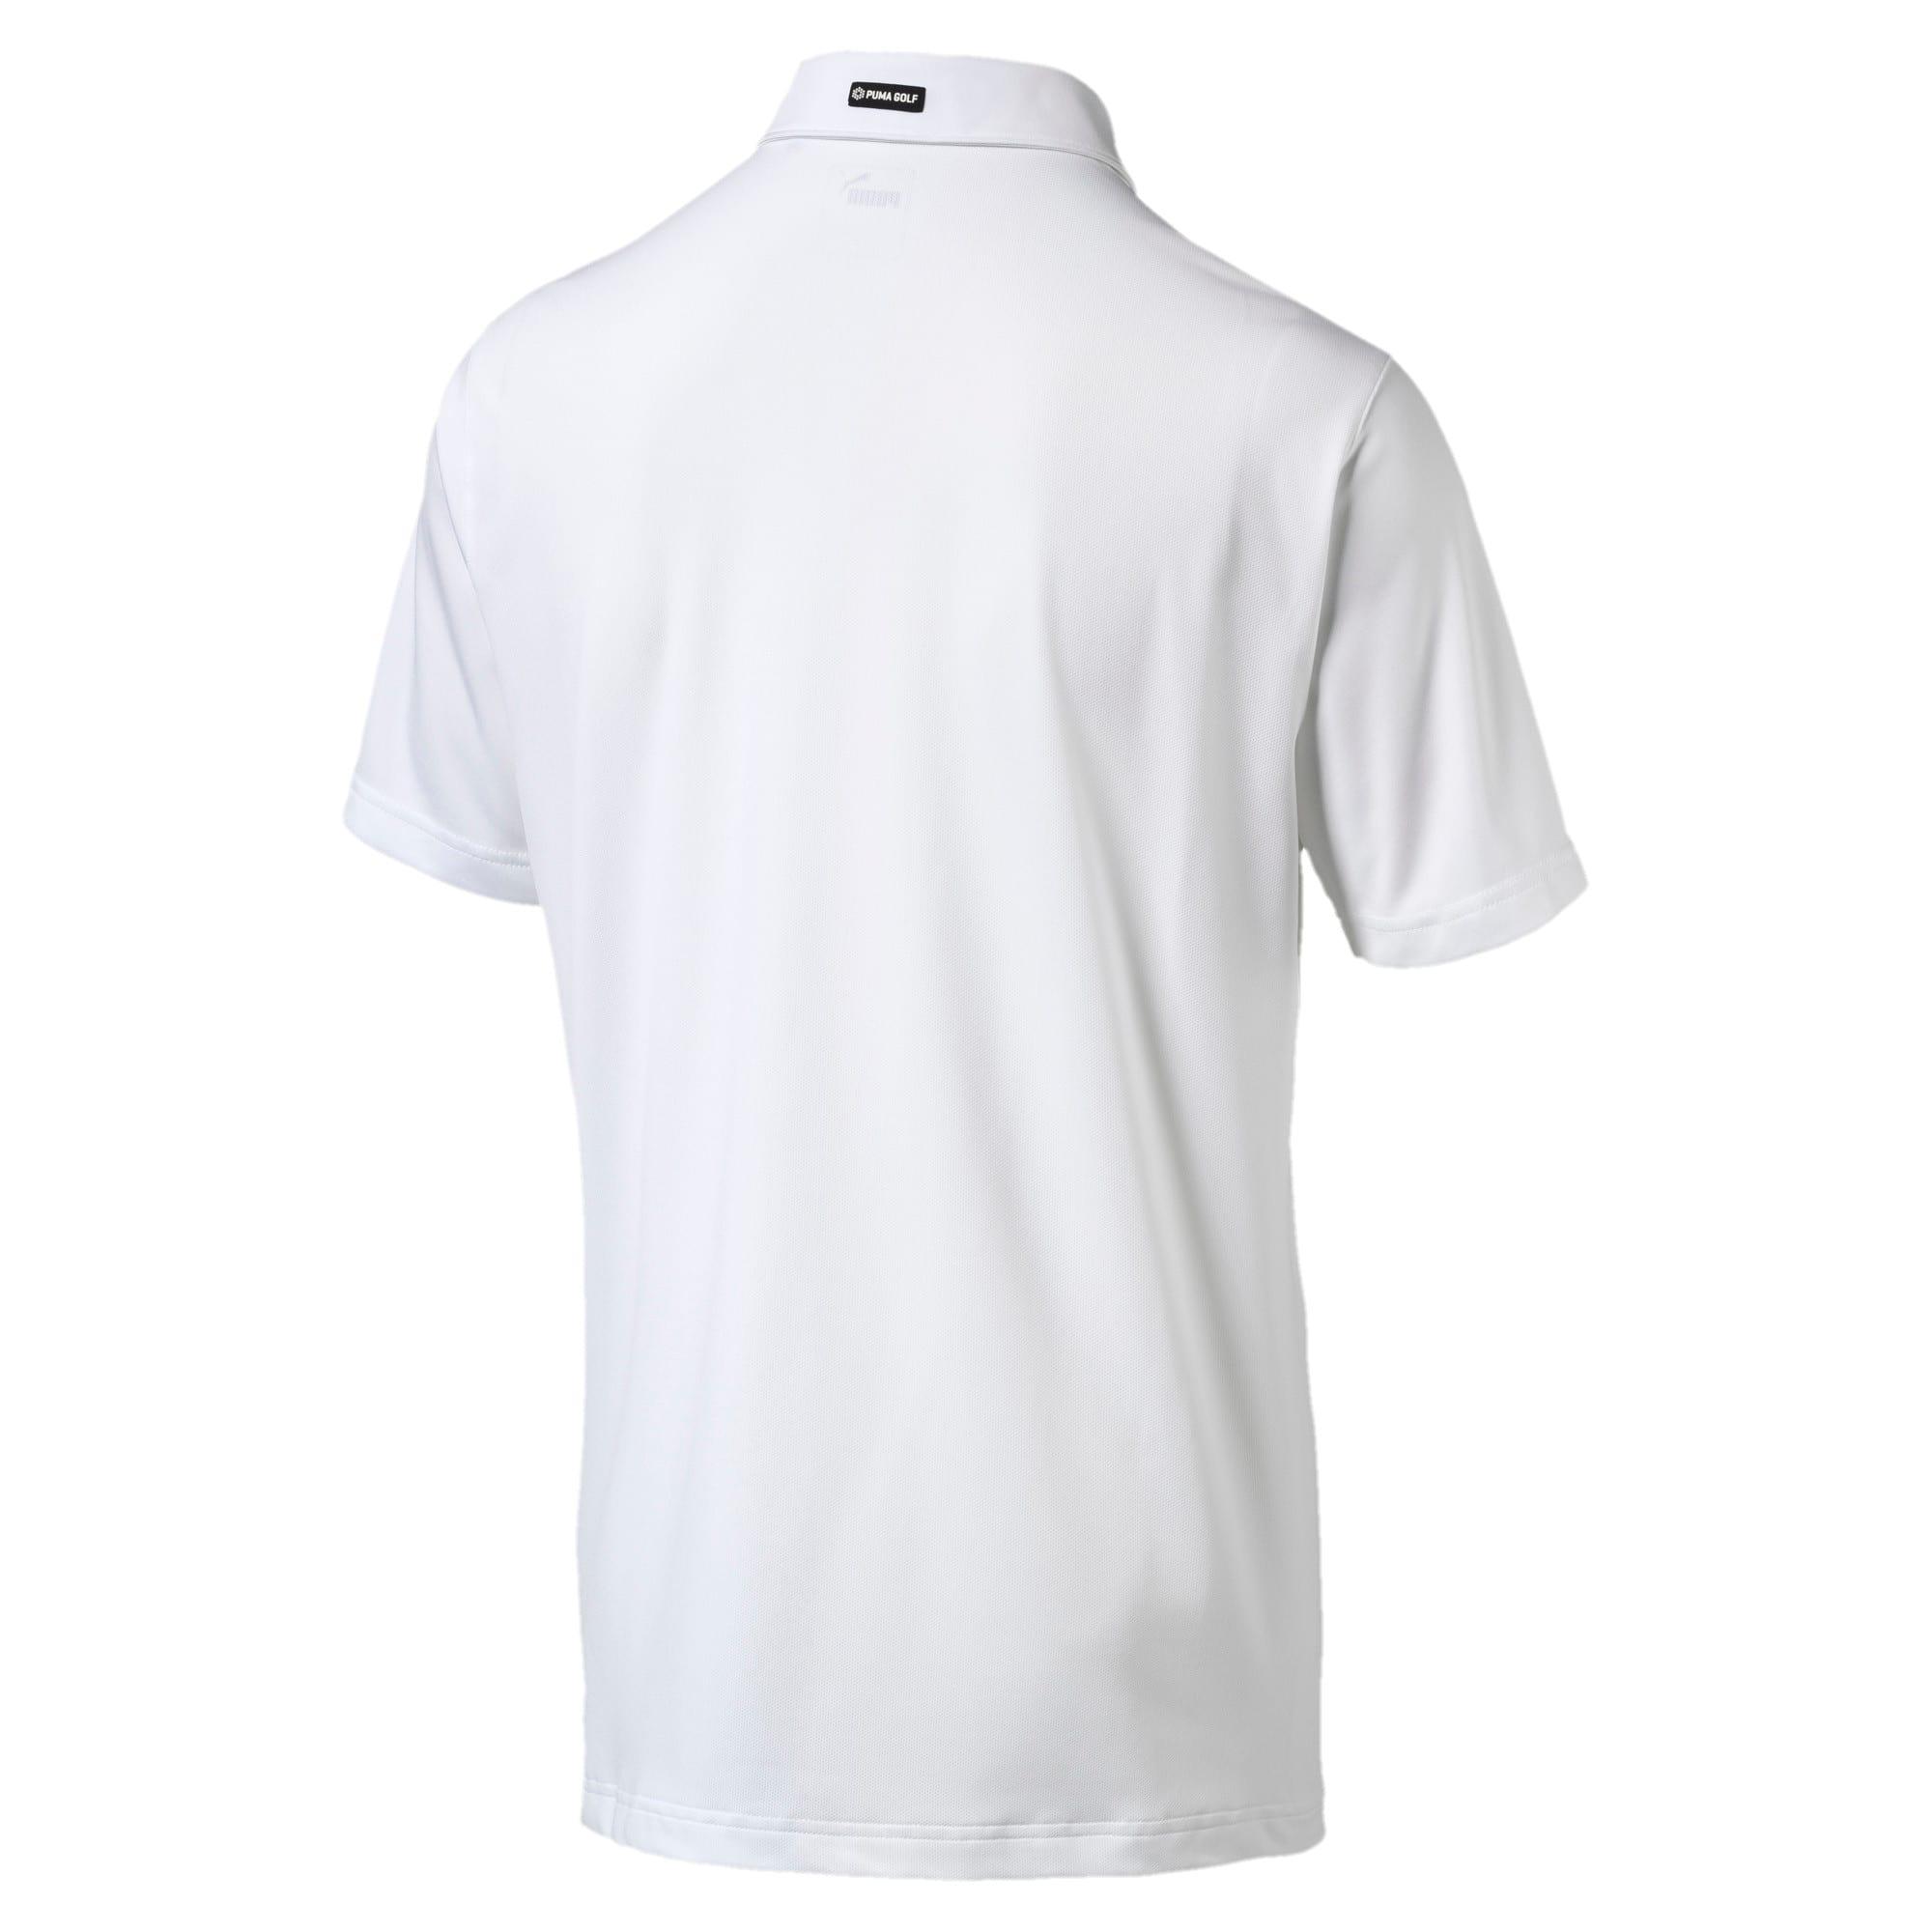 Thumbnail 2 of Golf Pounce Polo, bright white, medium-IND